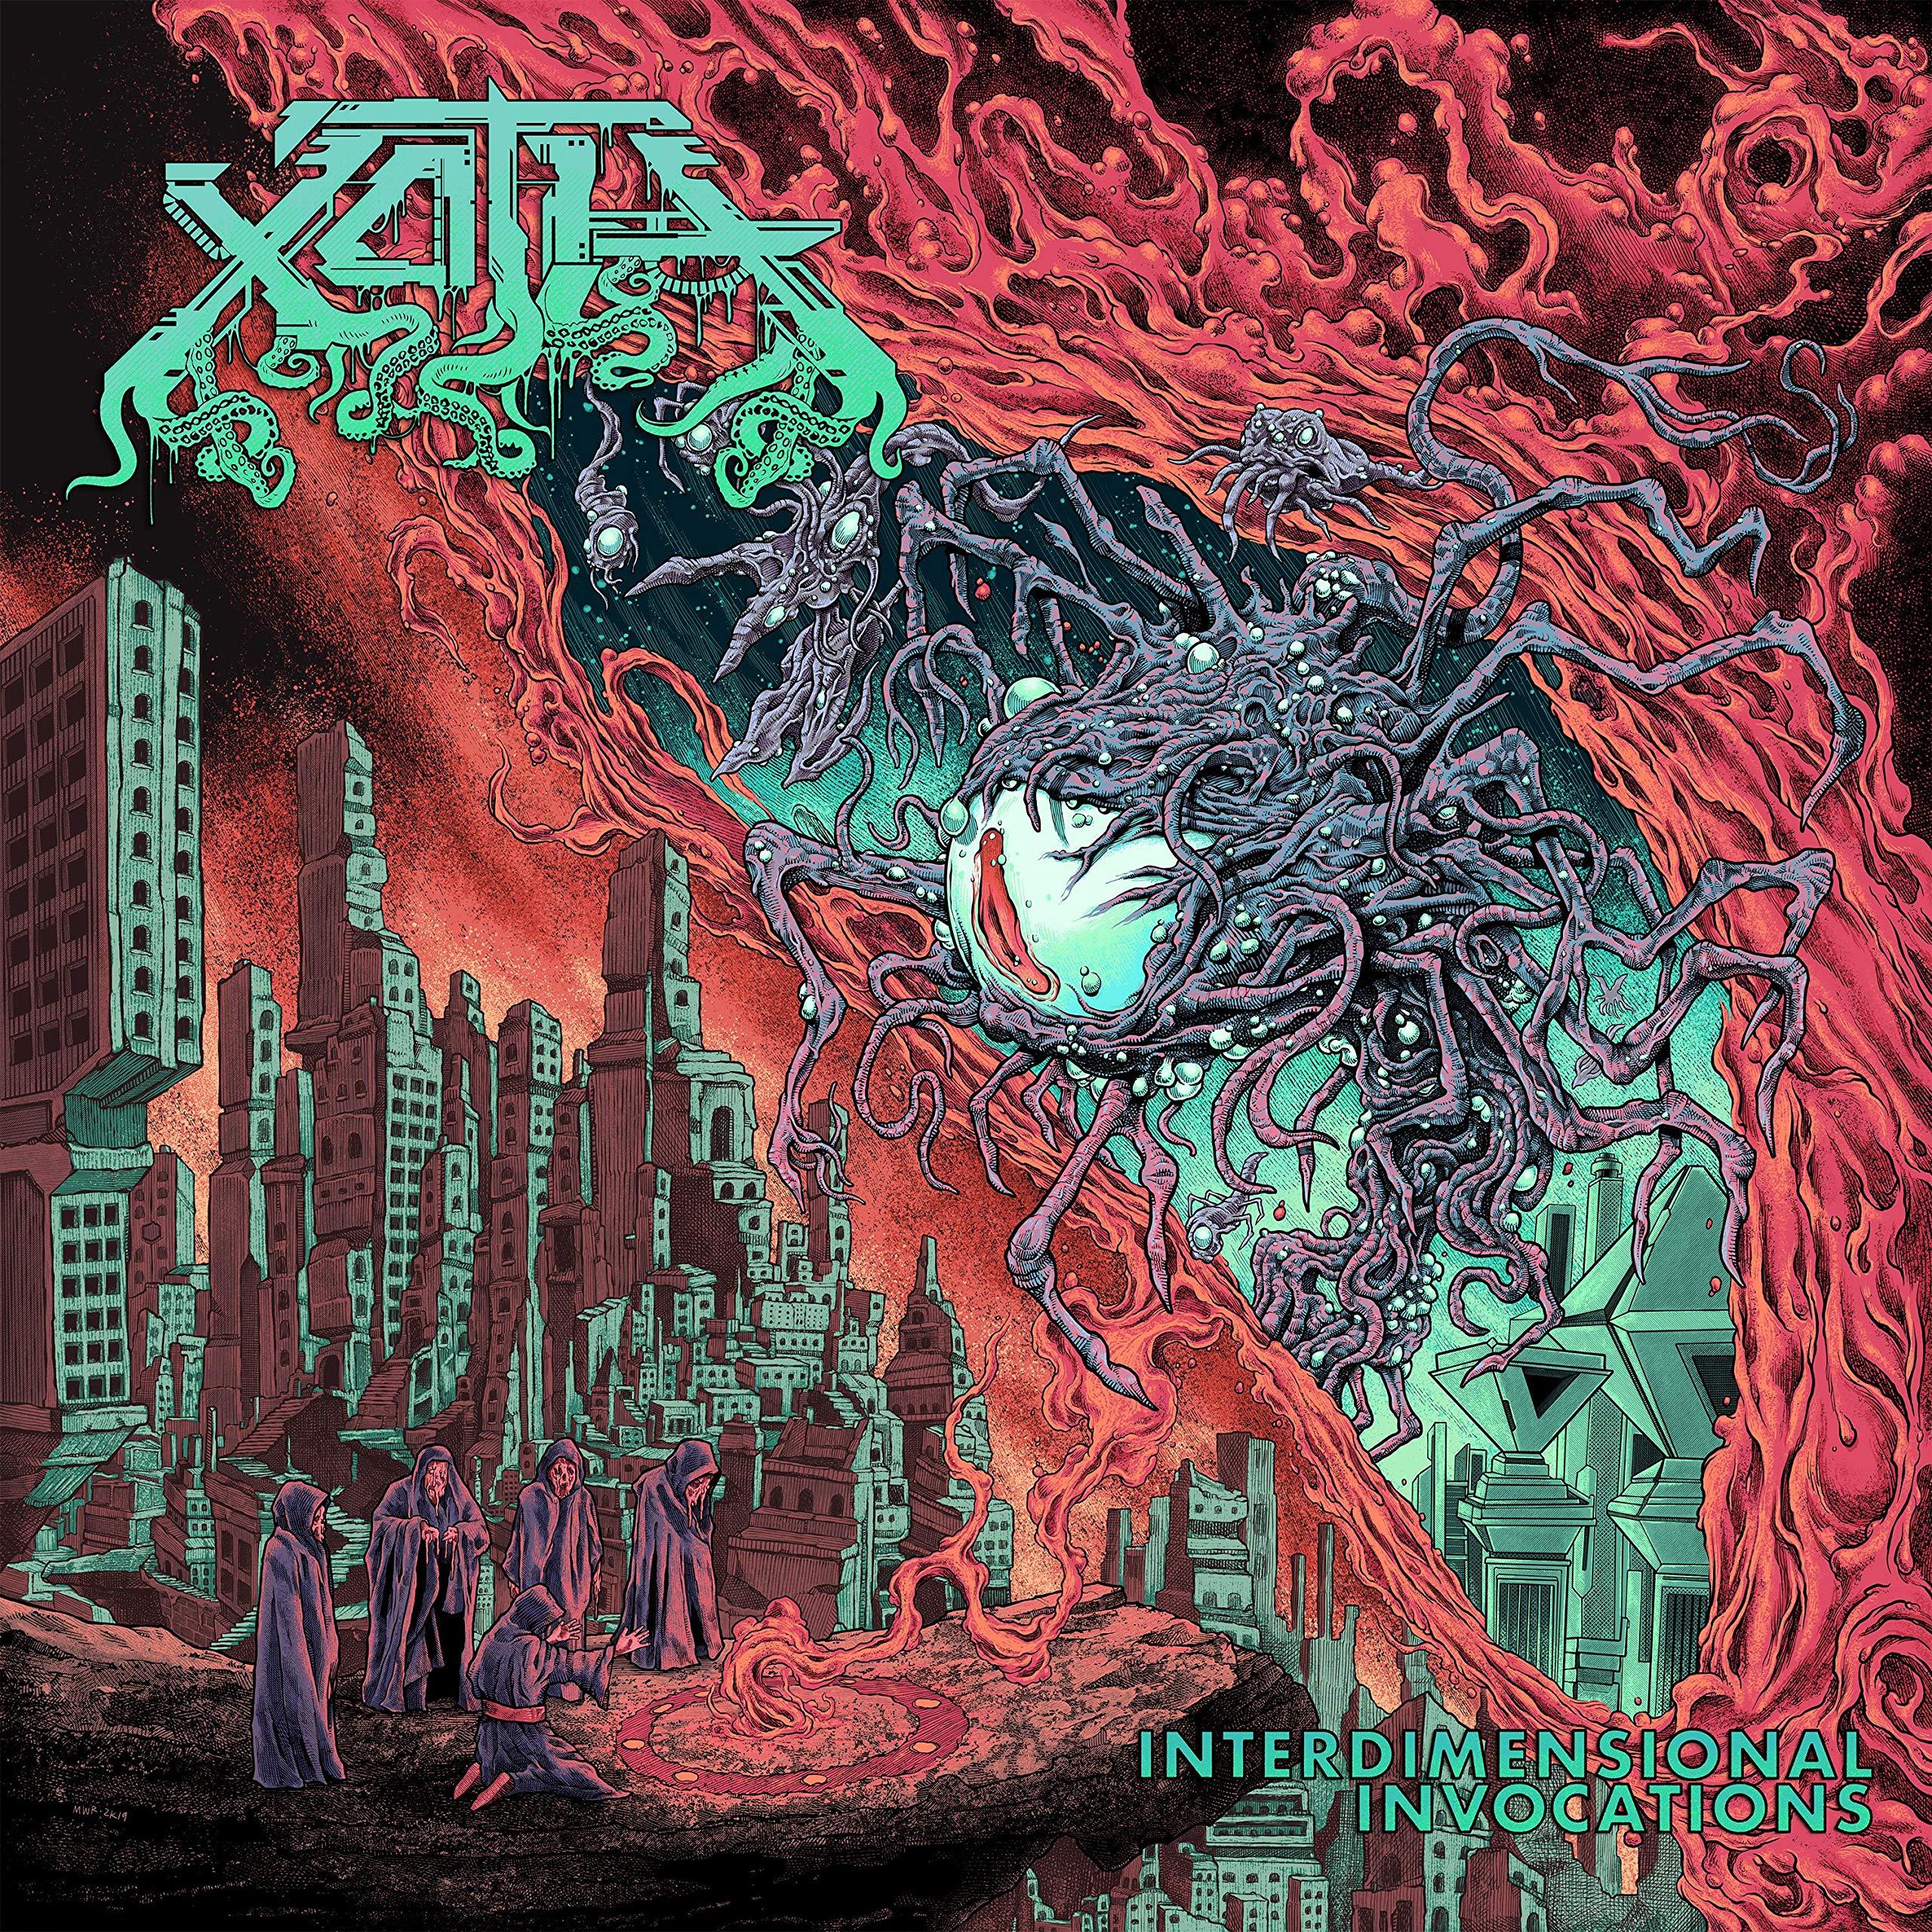 Xoth - Interdimensional Invocations (2019) [FLAC] Download